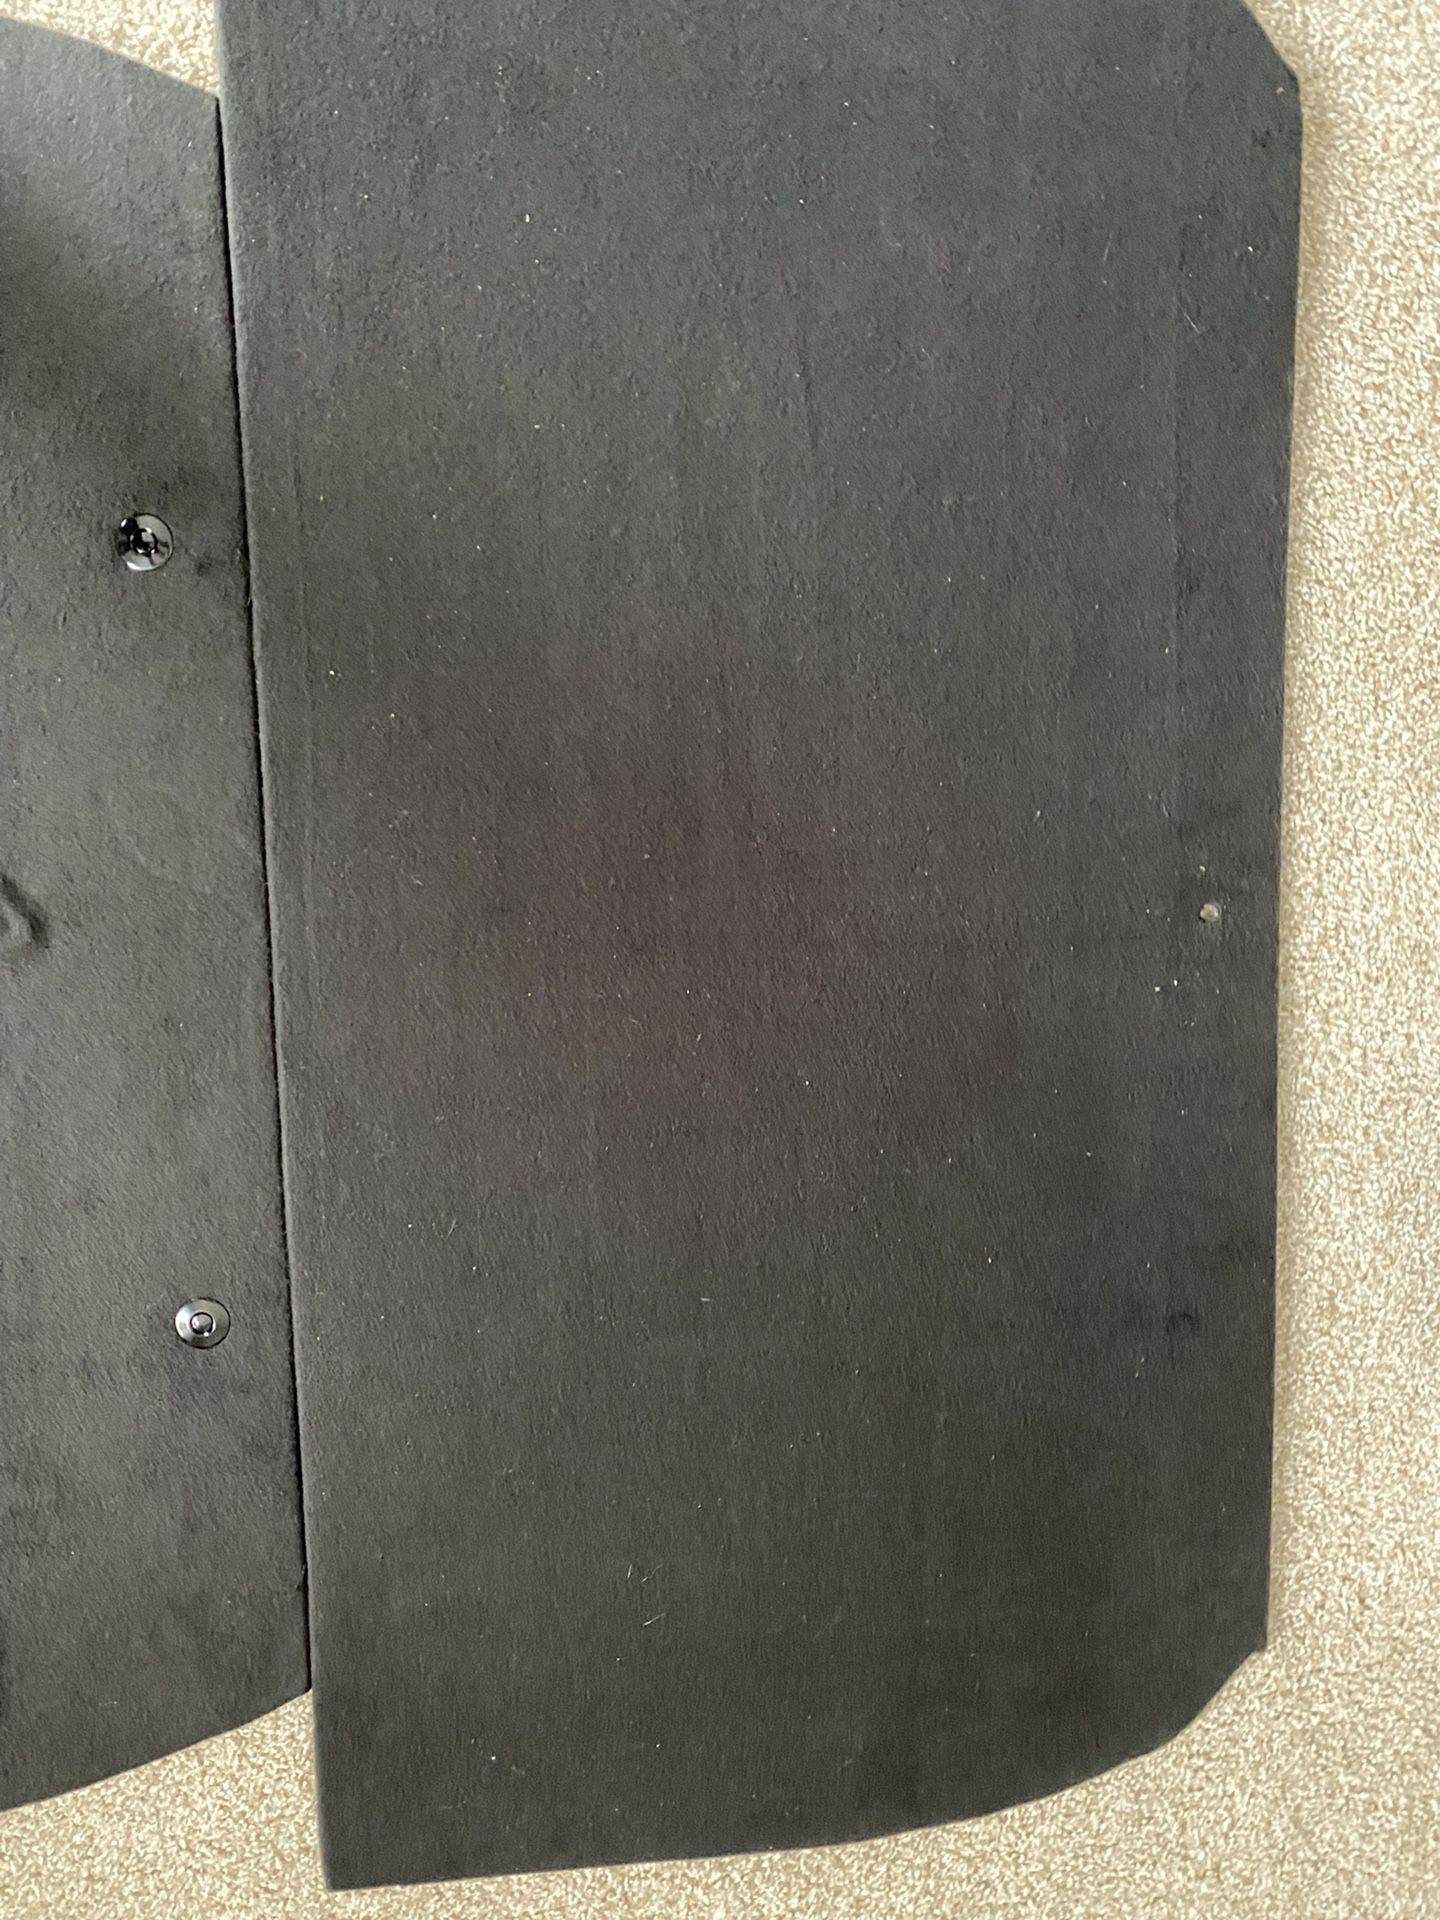 S550  MUSTANG REAR SEAT DELETE KIT